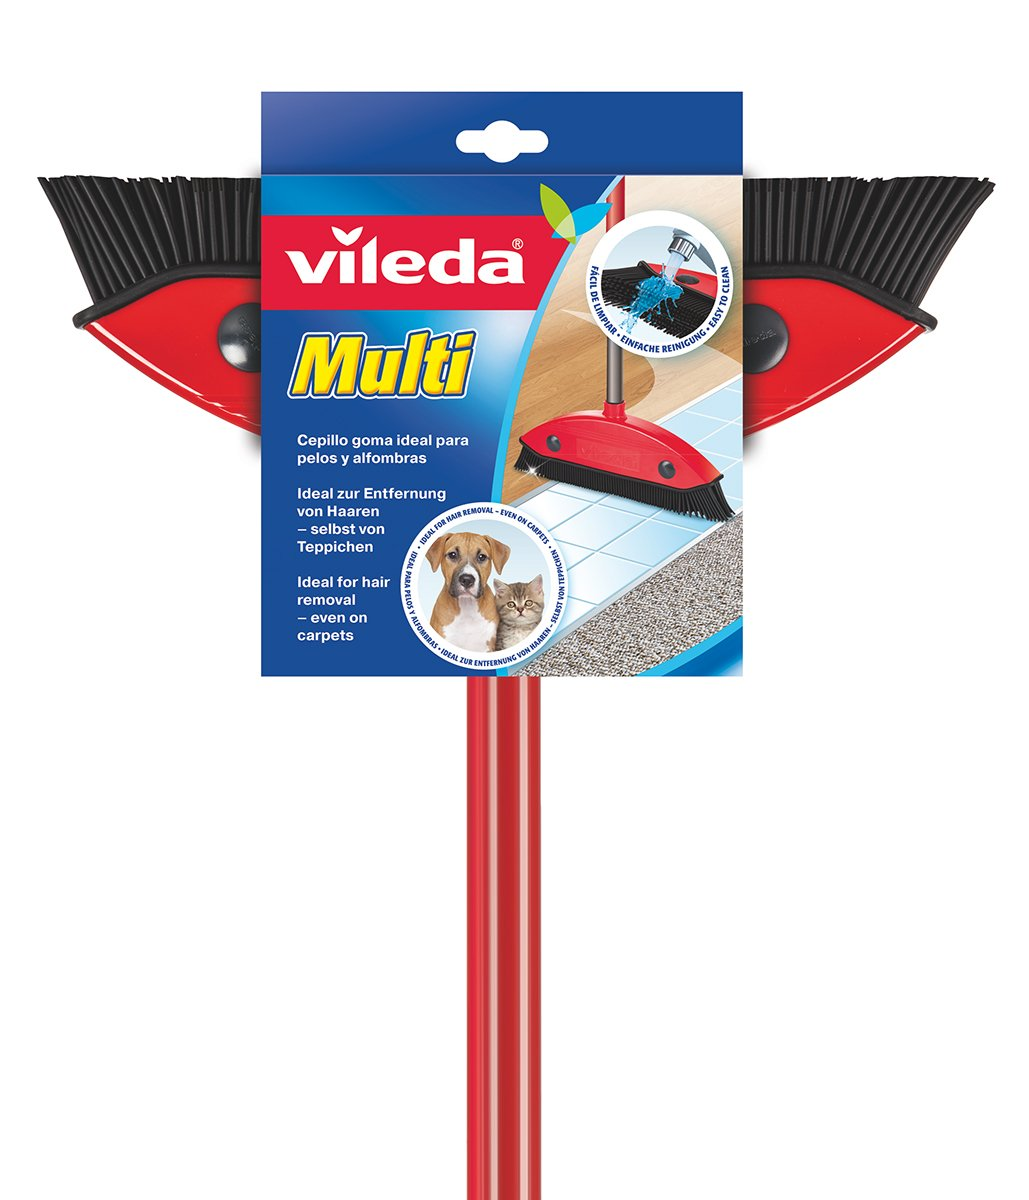 Vileda 142677 Balai Multi avec manche té lescopique Vileda GmbH